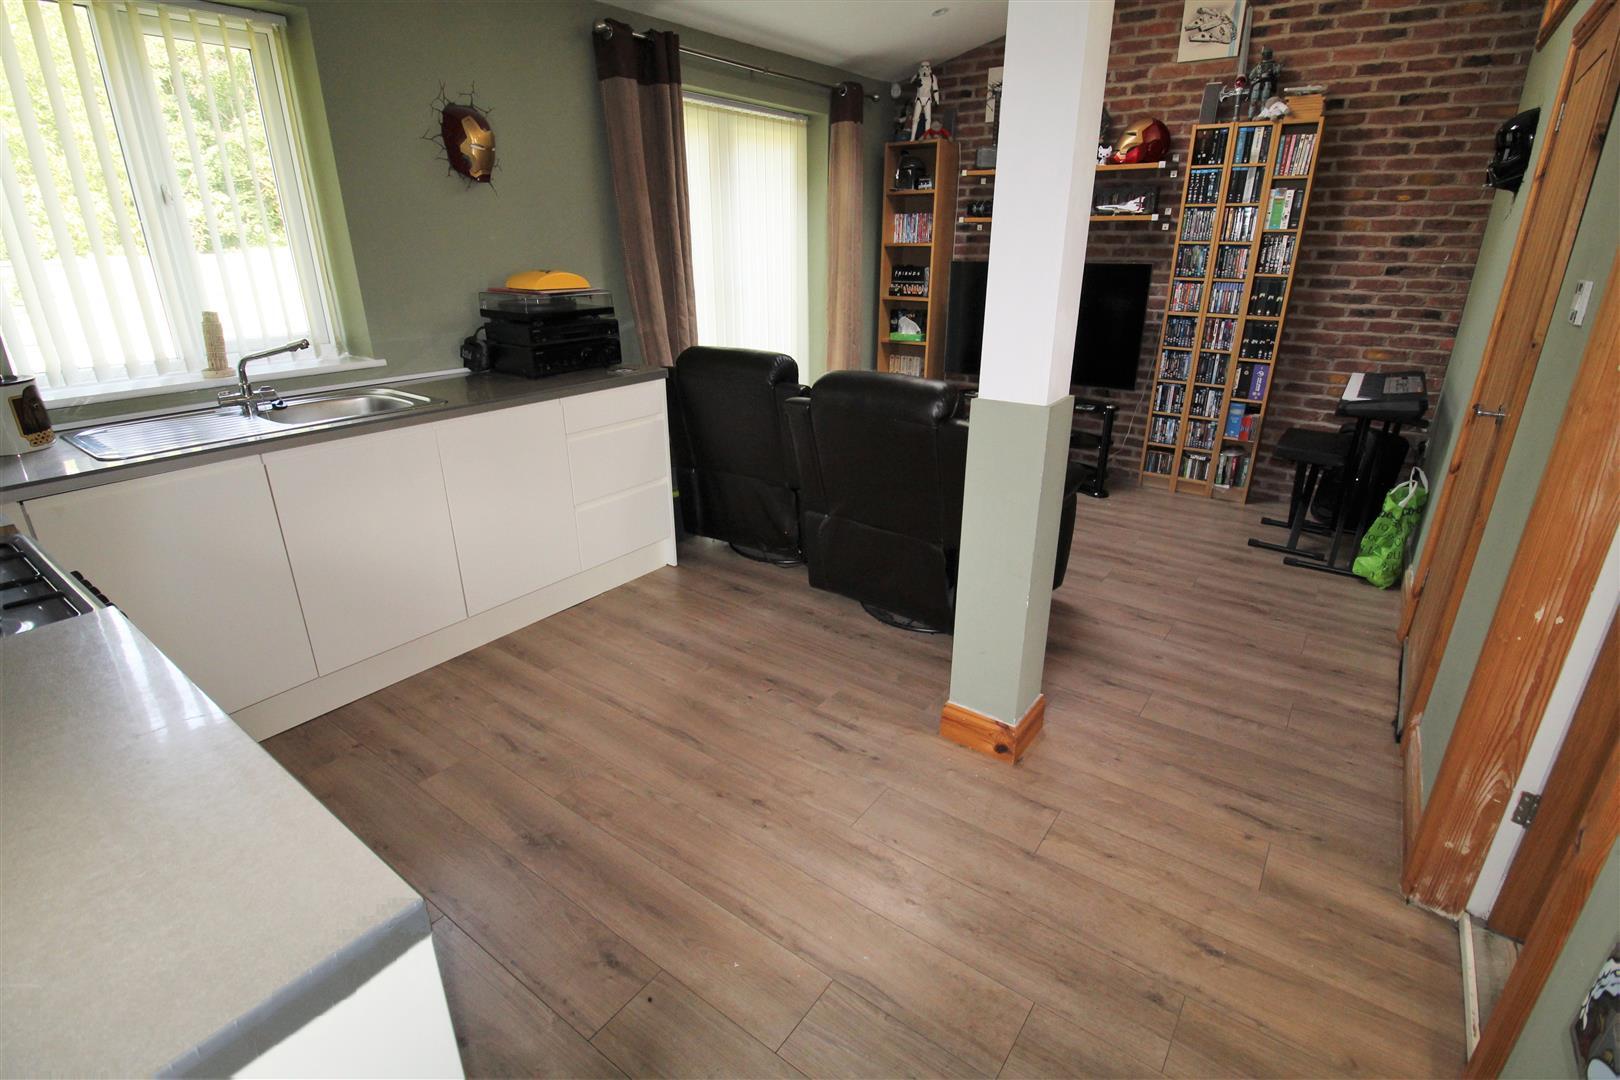 4 Bedrooms, House - Semi-Detached, Valentine Grove, Aintree Village, Liverpool